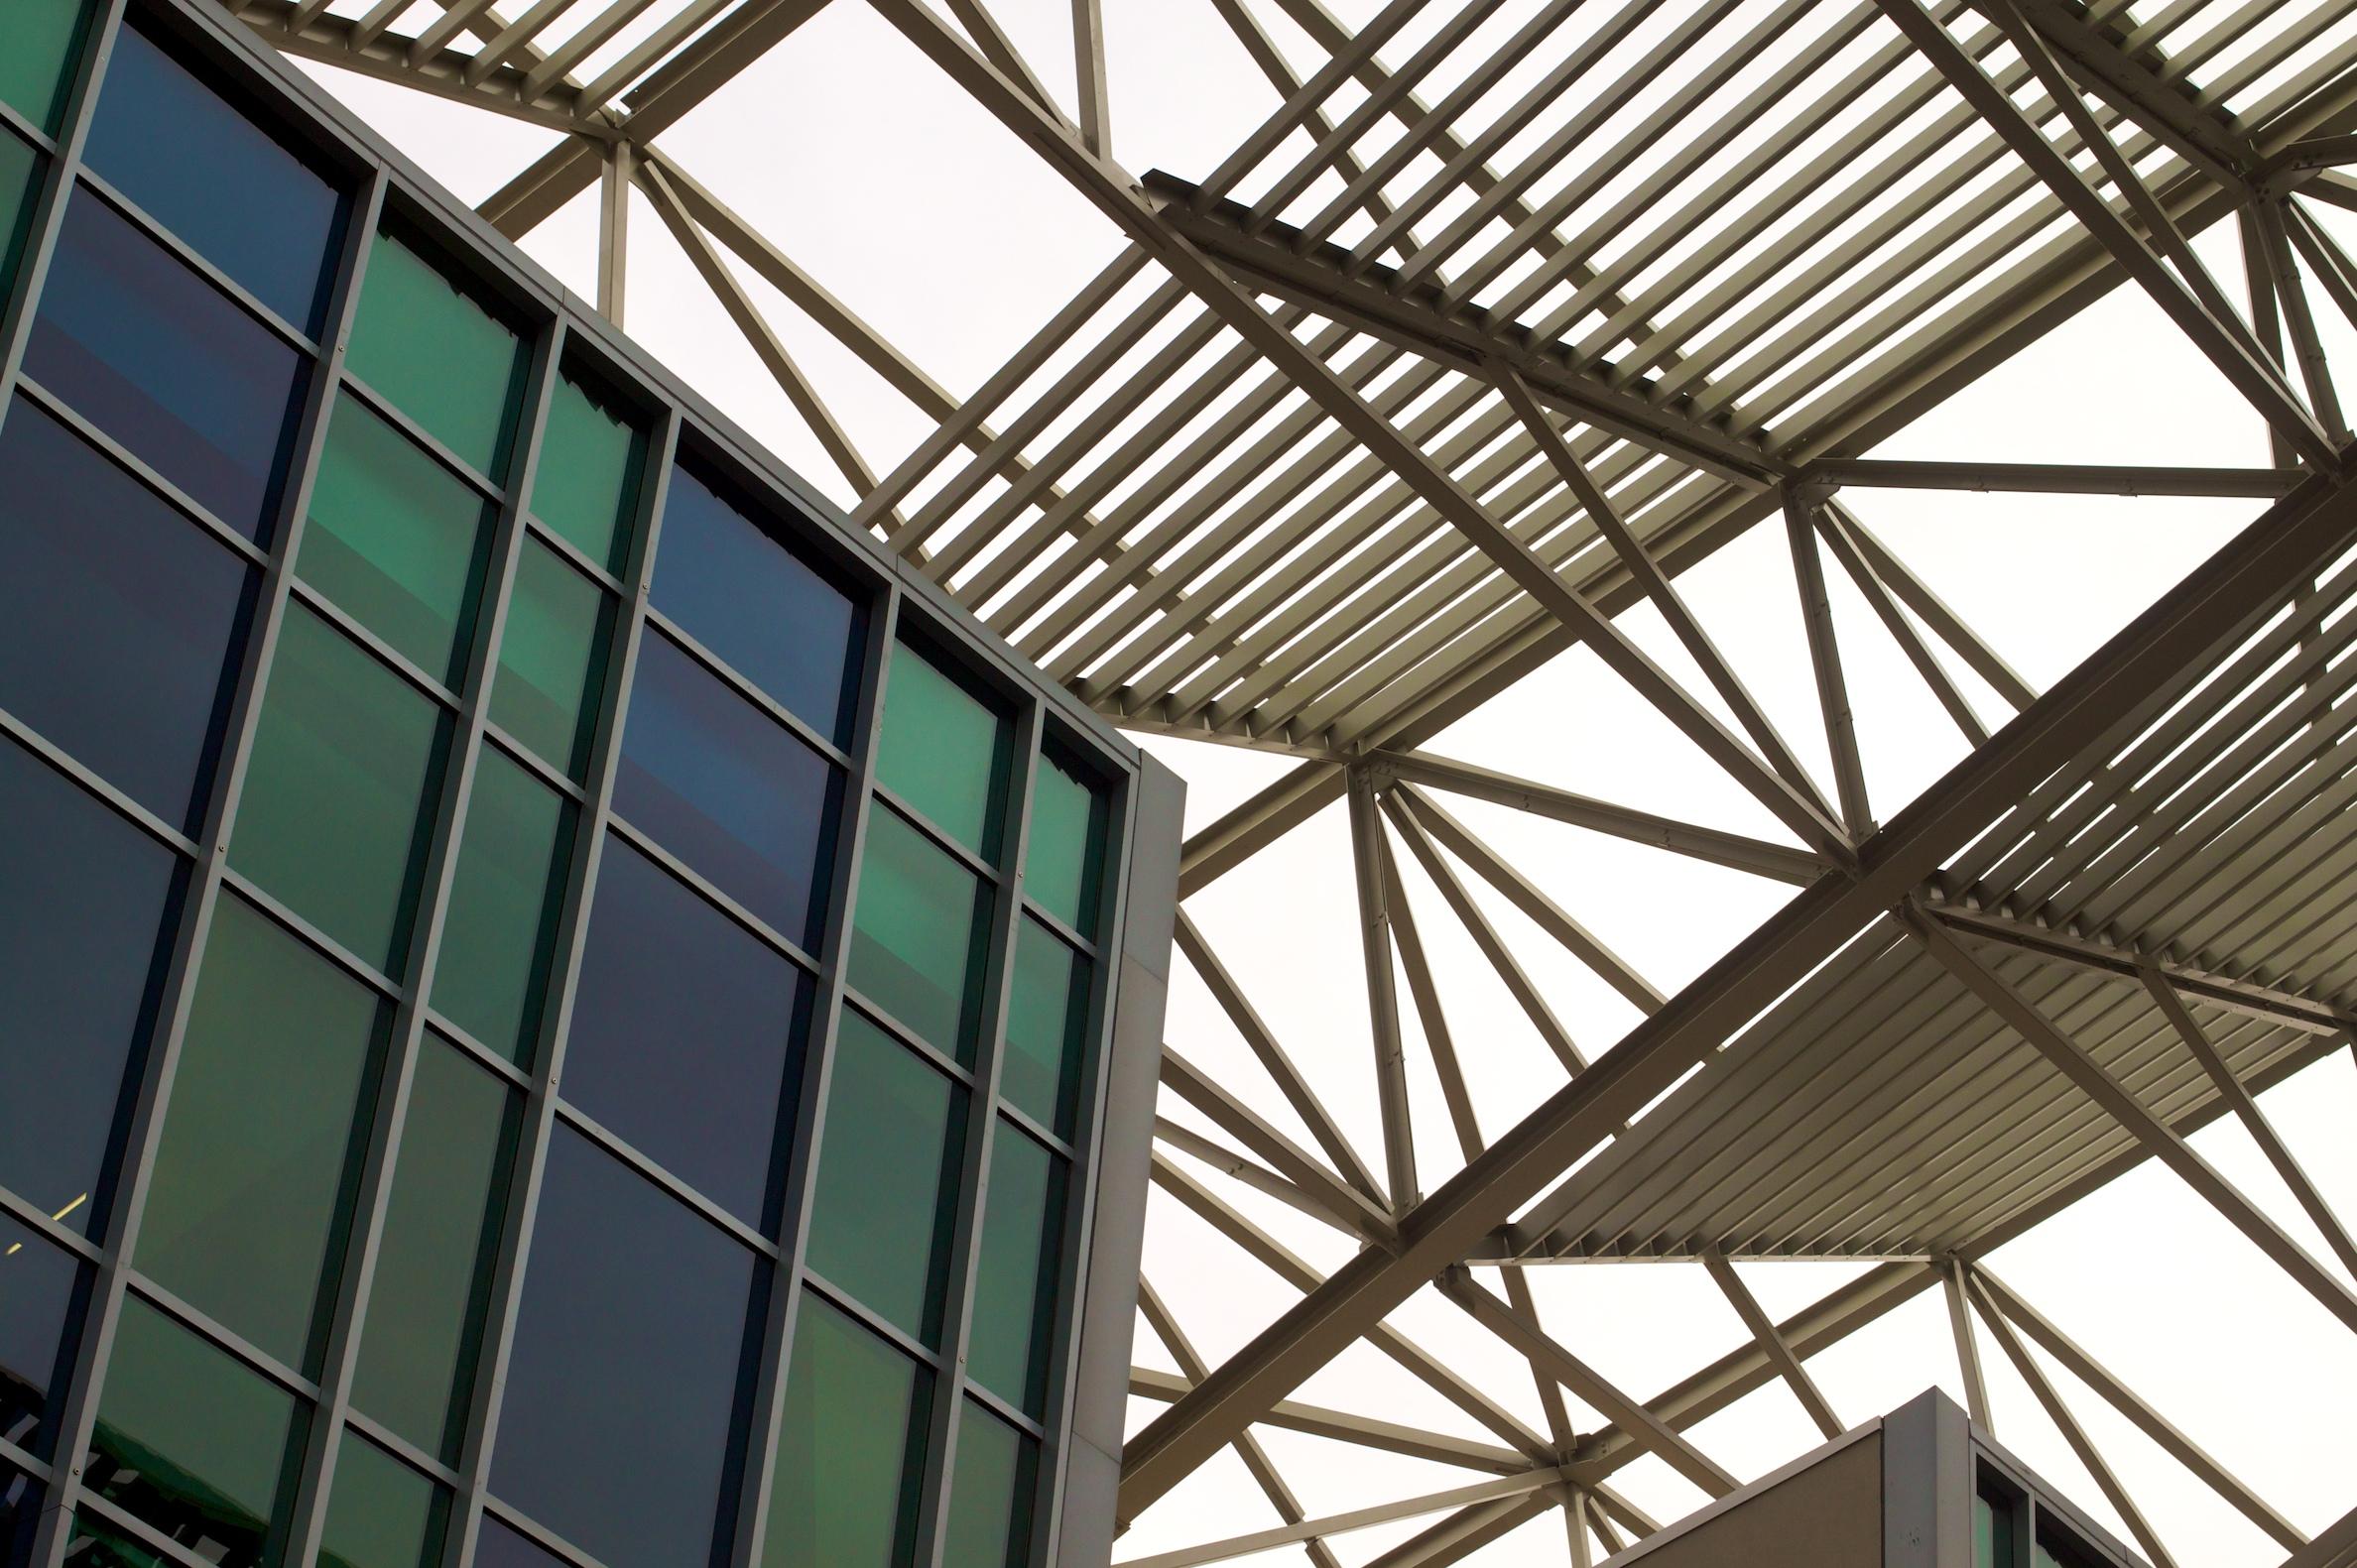 Fotos gratis : arquitectura, estructura, ventana, techo, rascacielos ...